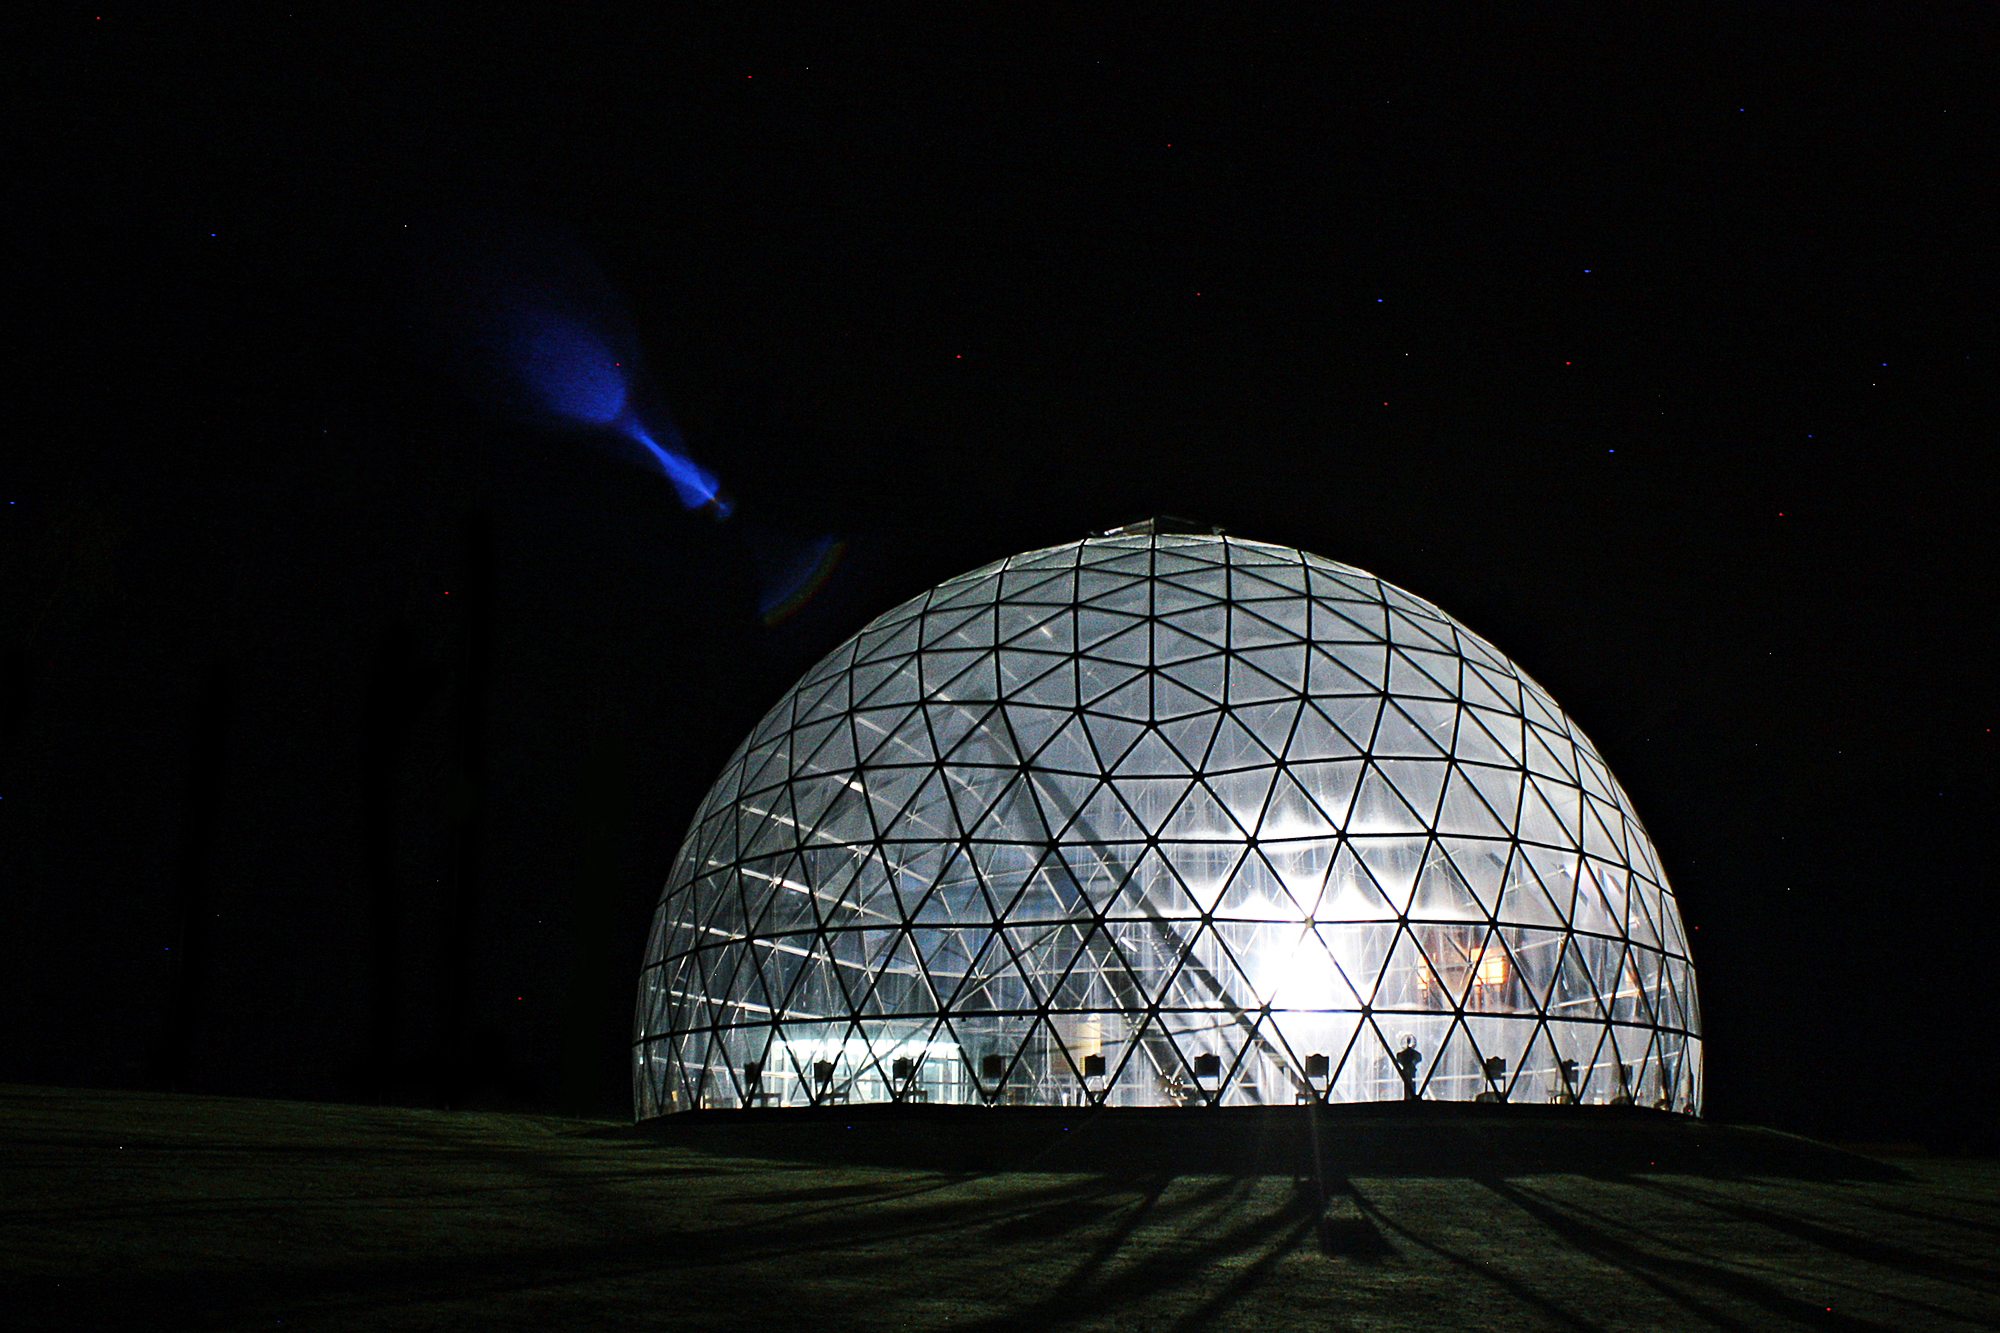 2016-11-04-merkines-piramide